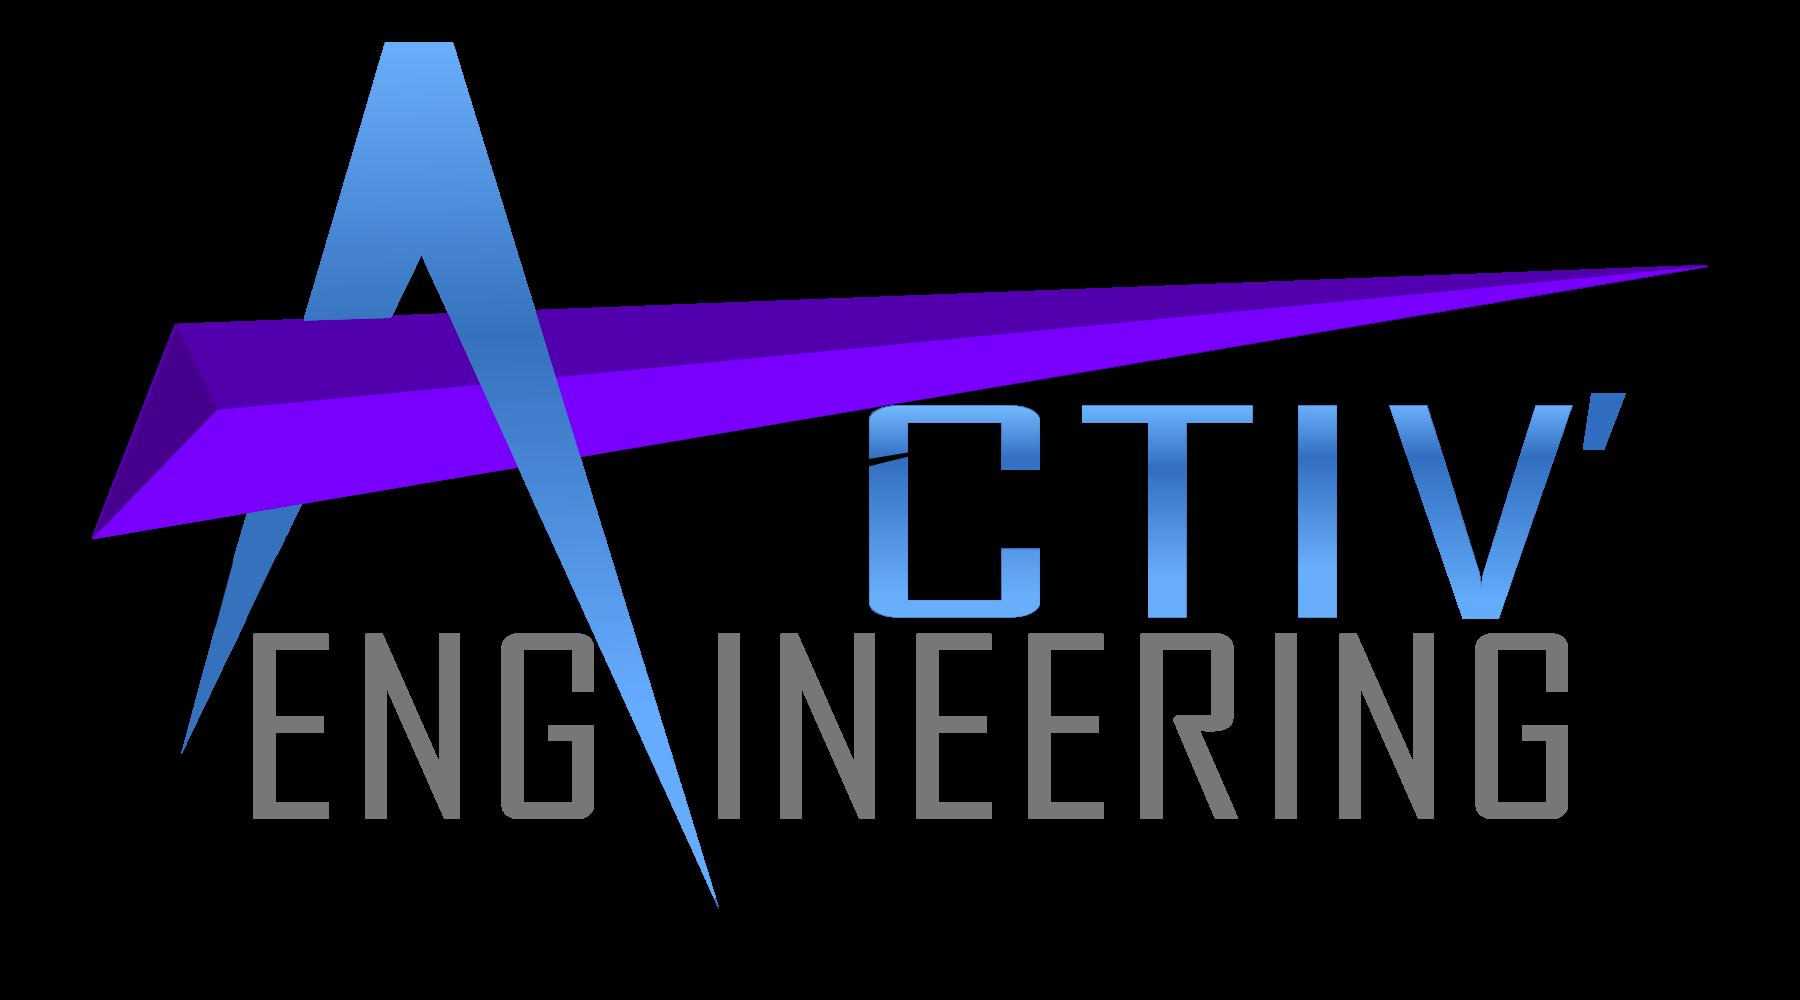 Activ-Engineering